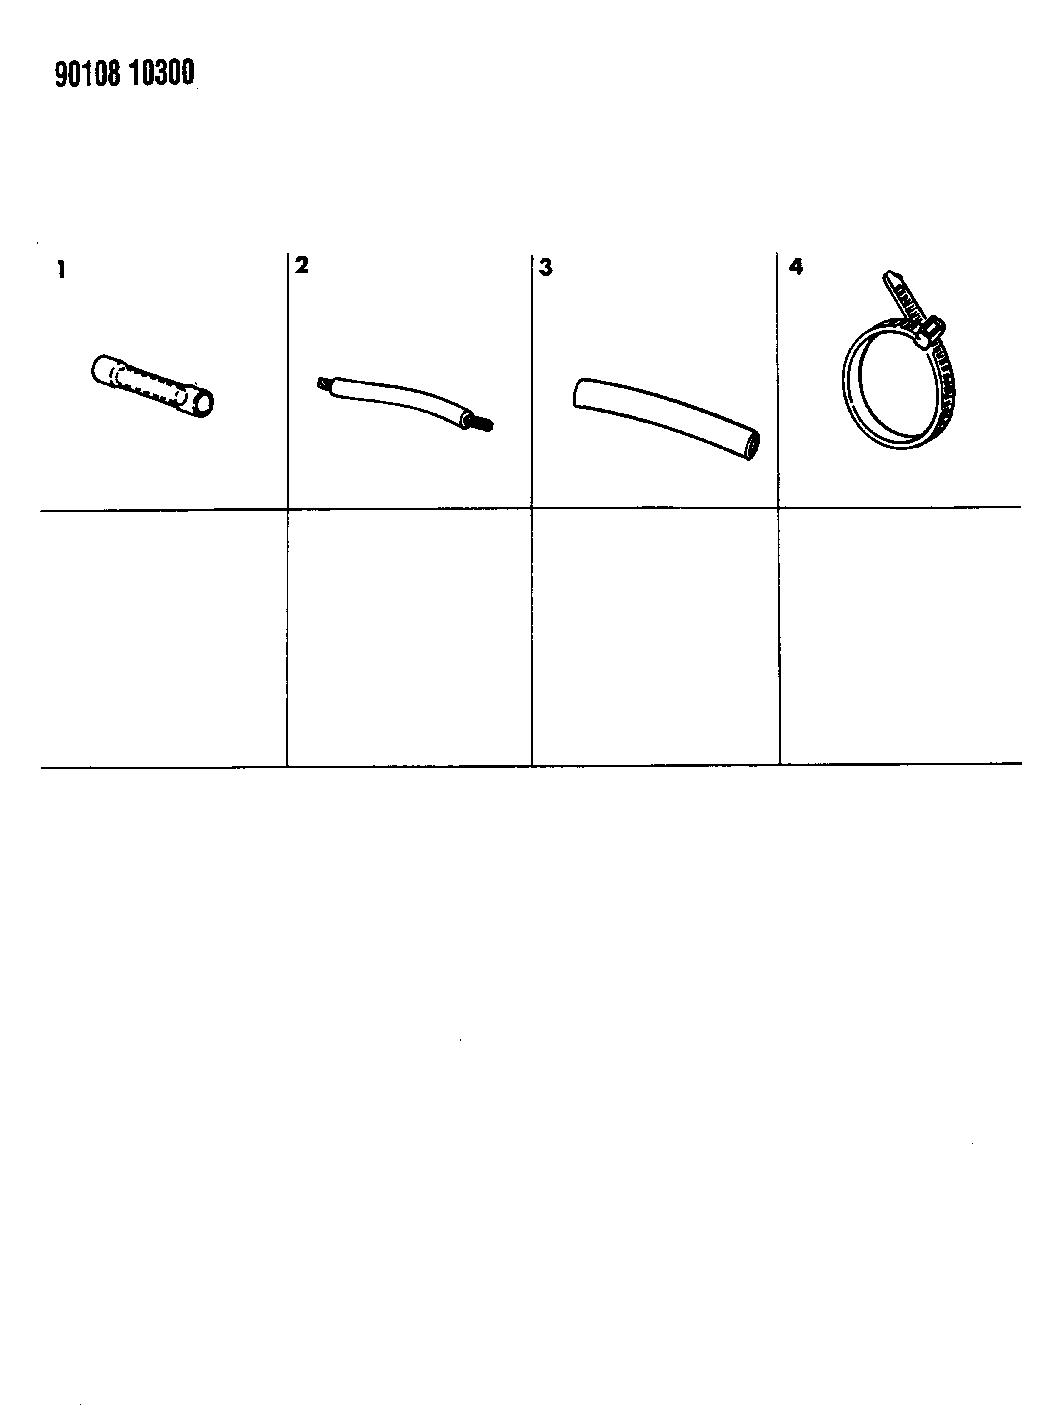 1990 dodge daytona wiring diagram gc 2375  dodge daytona wiring harness  gc 2375  dodge daytona wiring harness